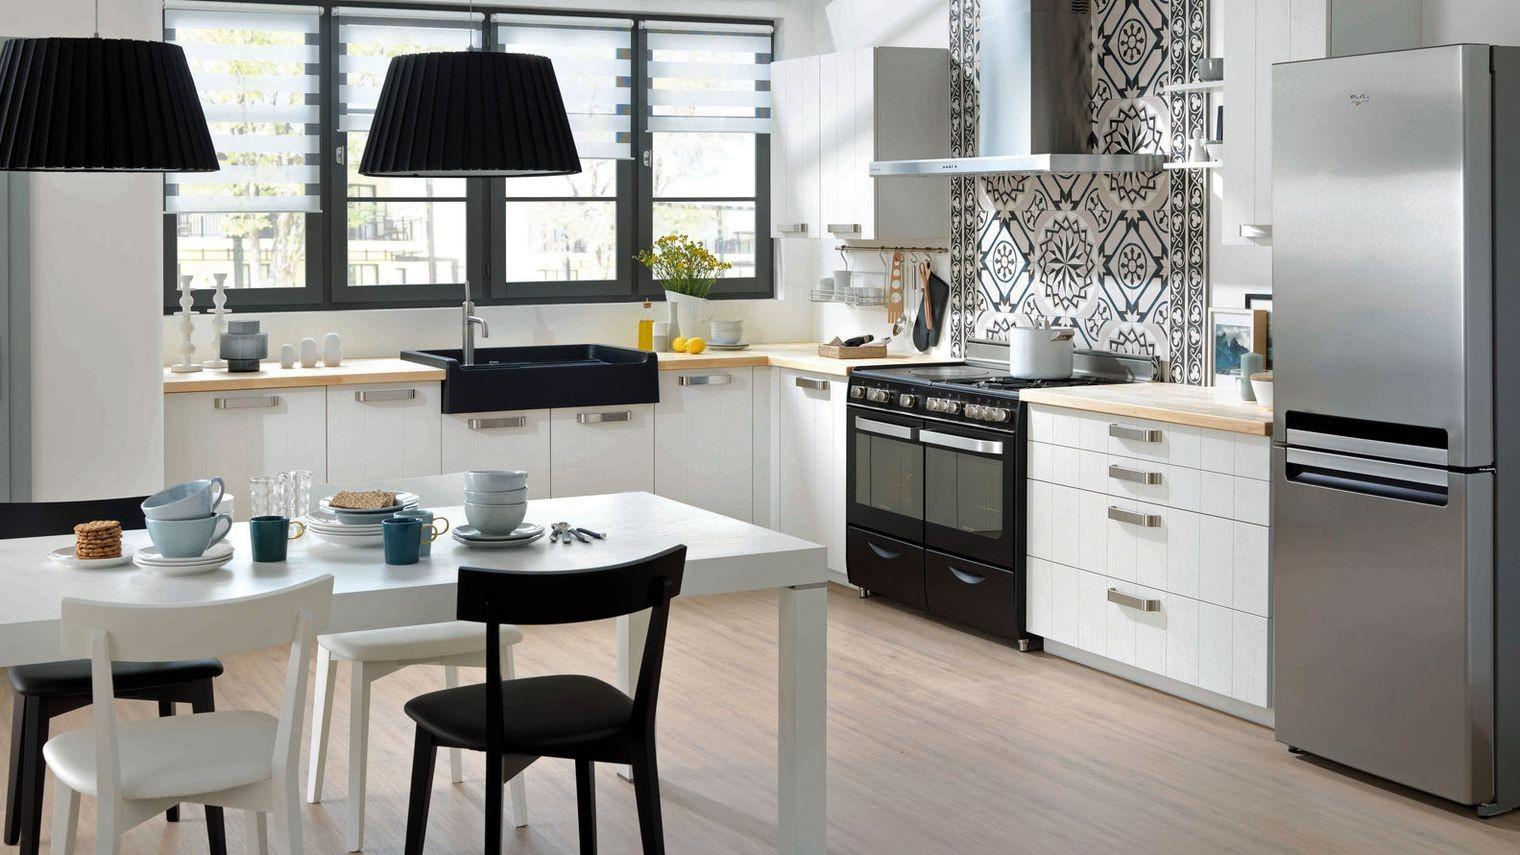 Meuble Salle De Bain Bricoman Beau Galerie Meuble Cuisine Bri An New Accesoire Cuisine Kit De Cuisine